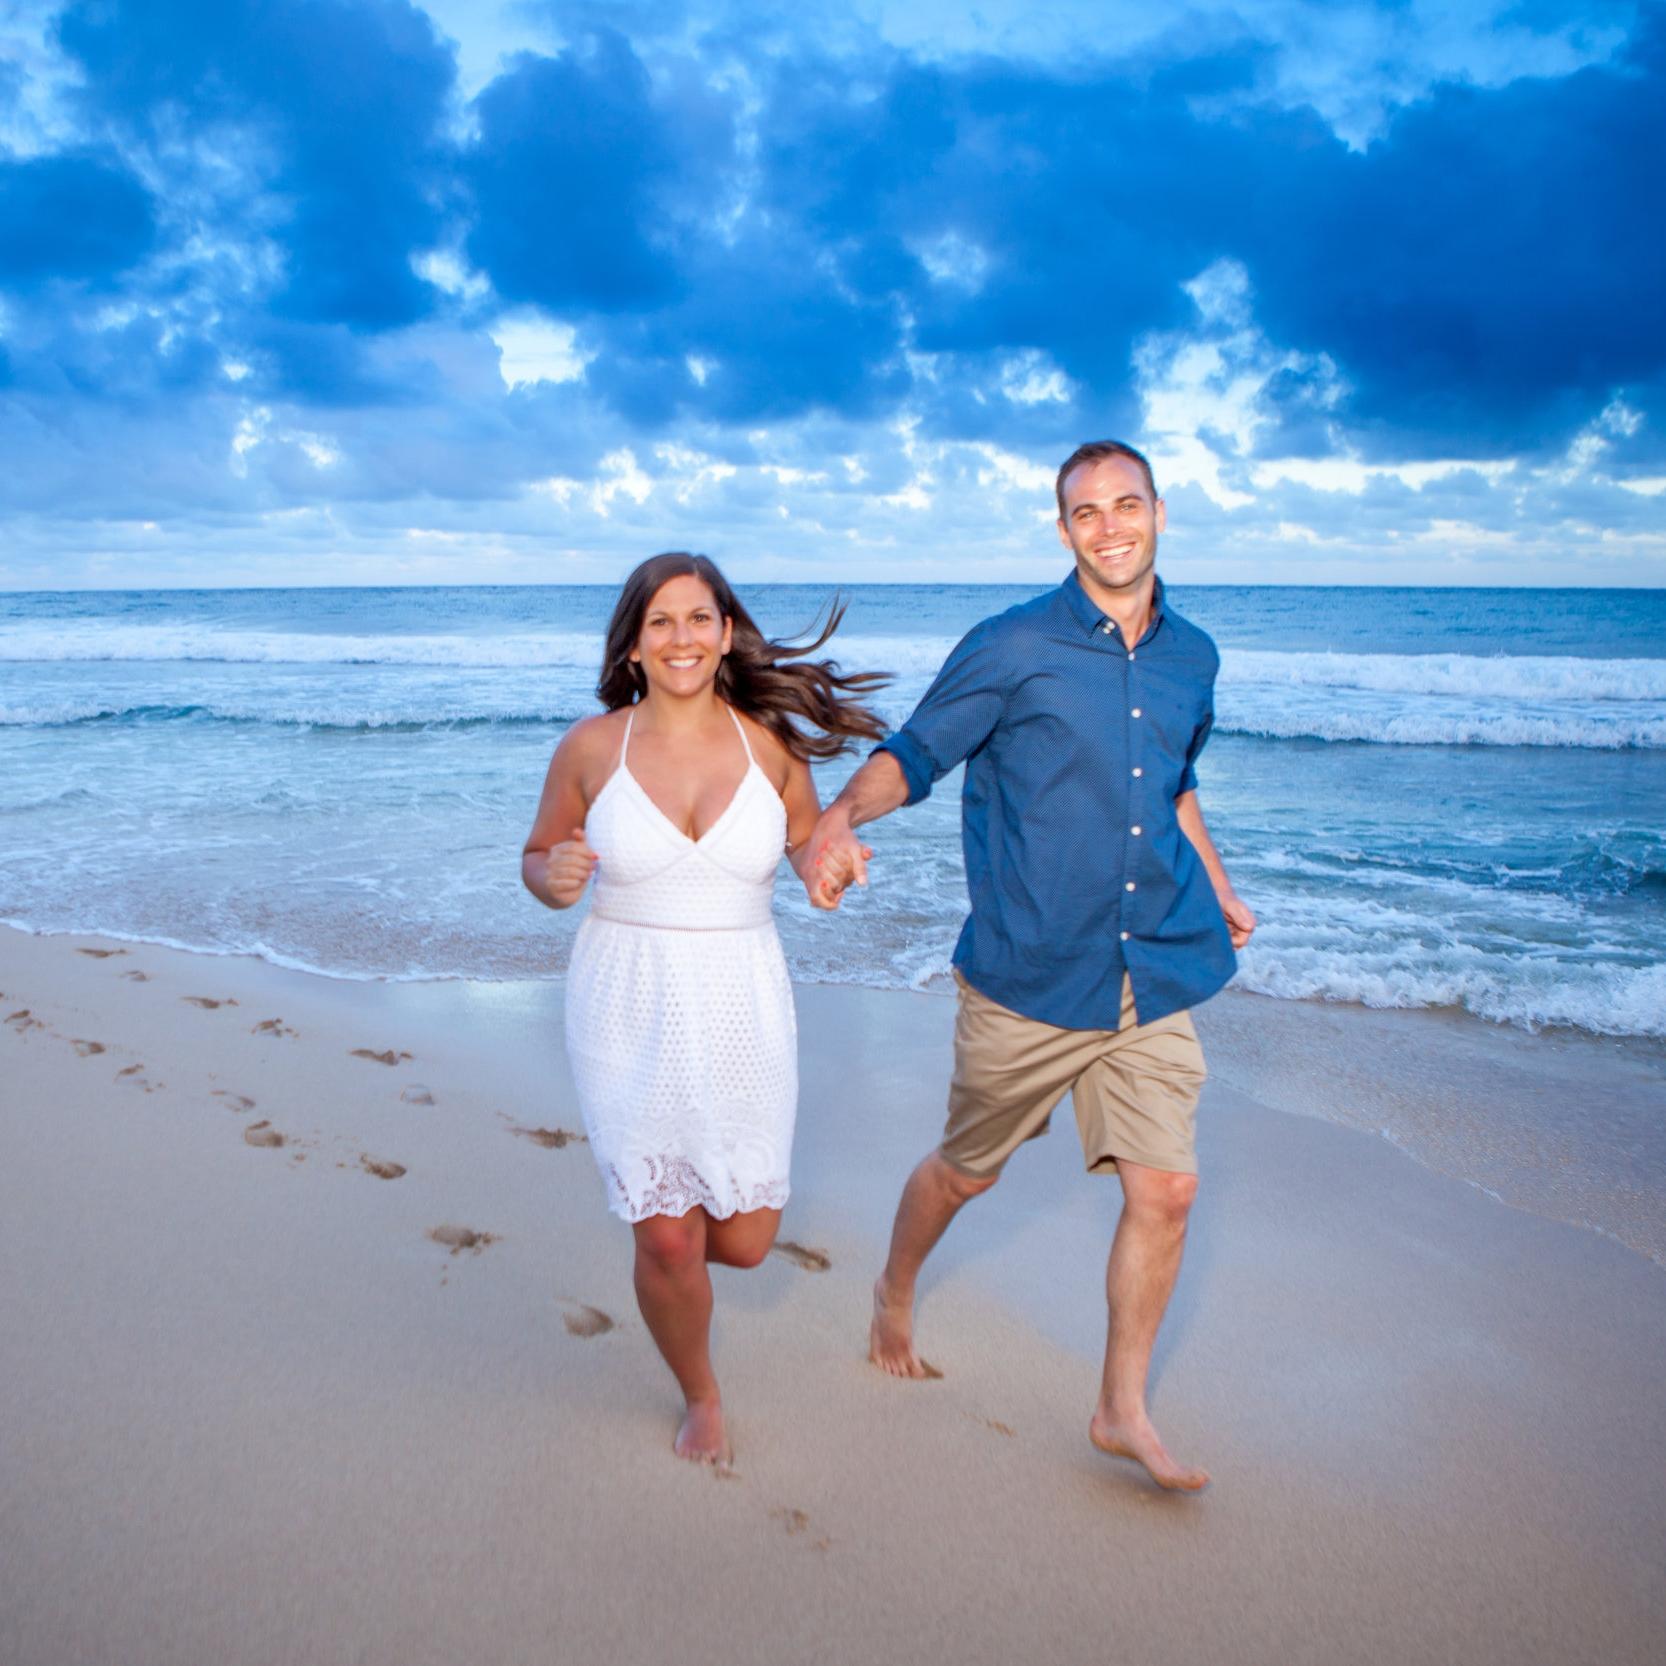 Kauai, HI Honeymoon   May 25, 2017